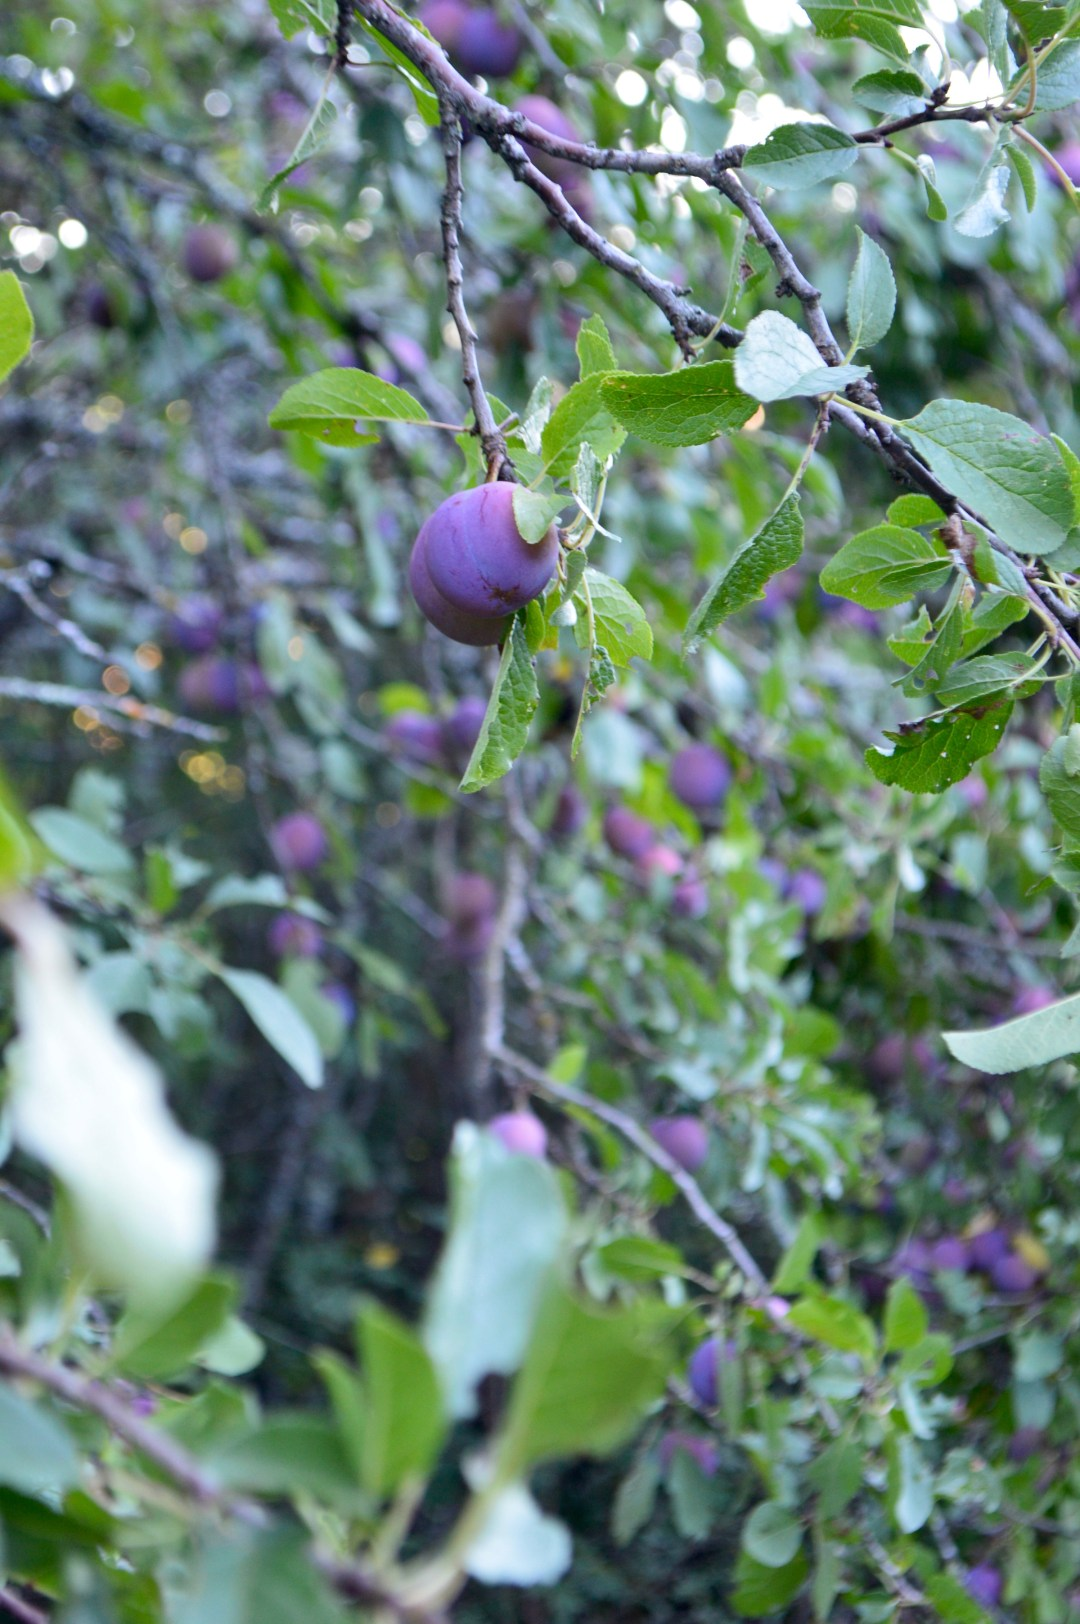 Arbre Prune Plum Tree Aveyron France